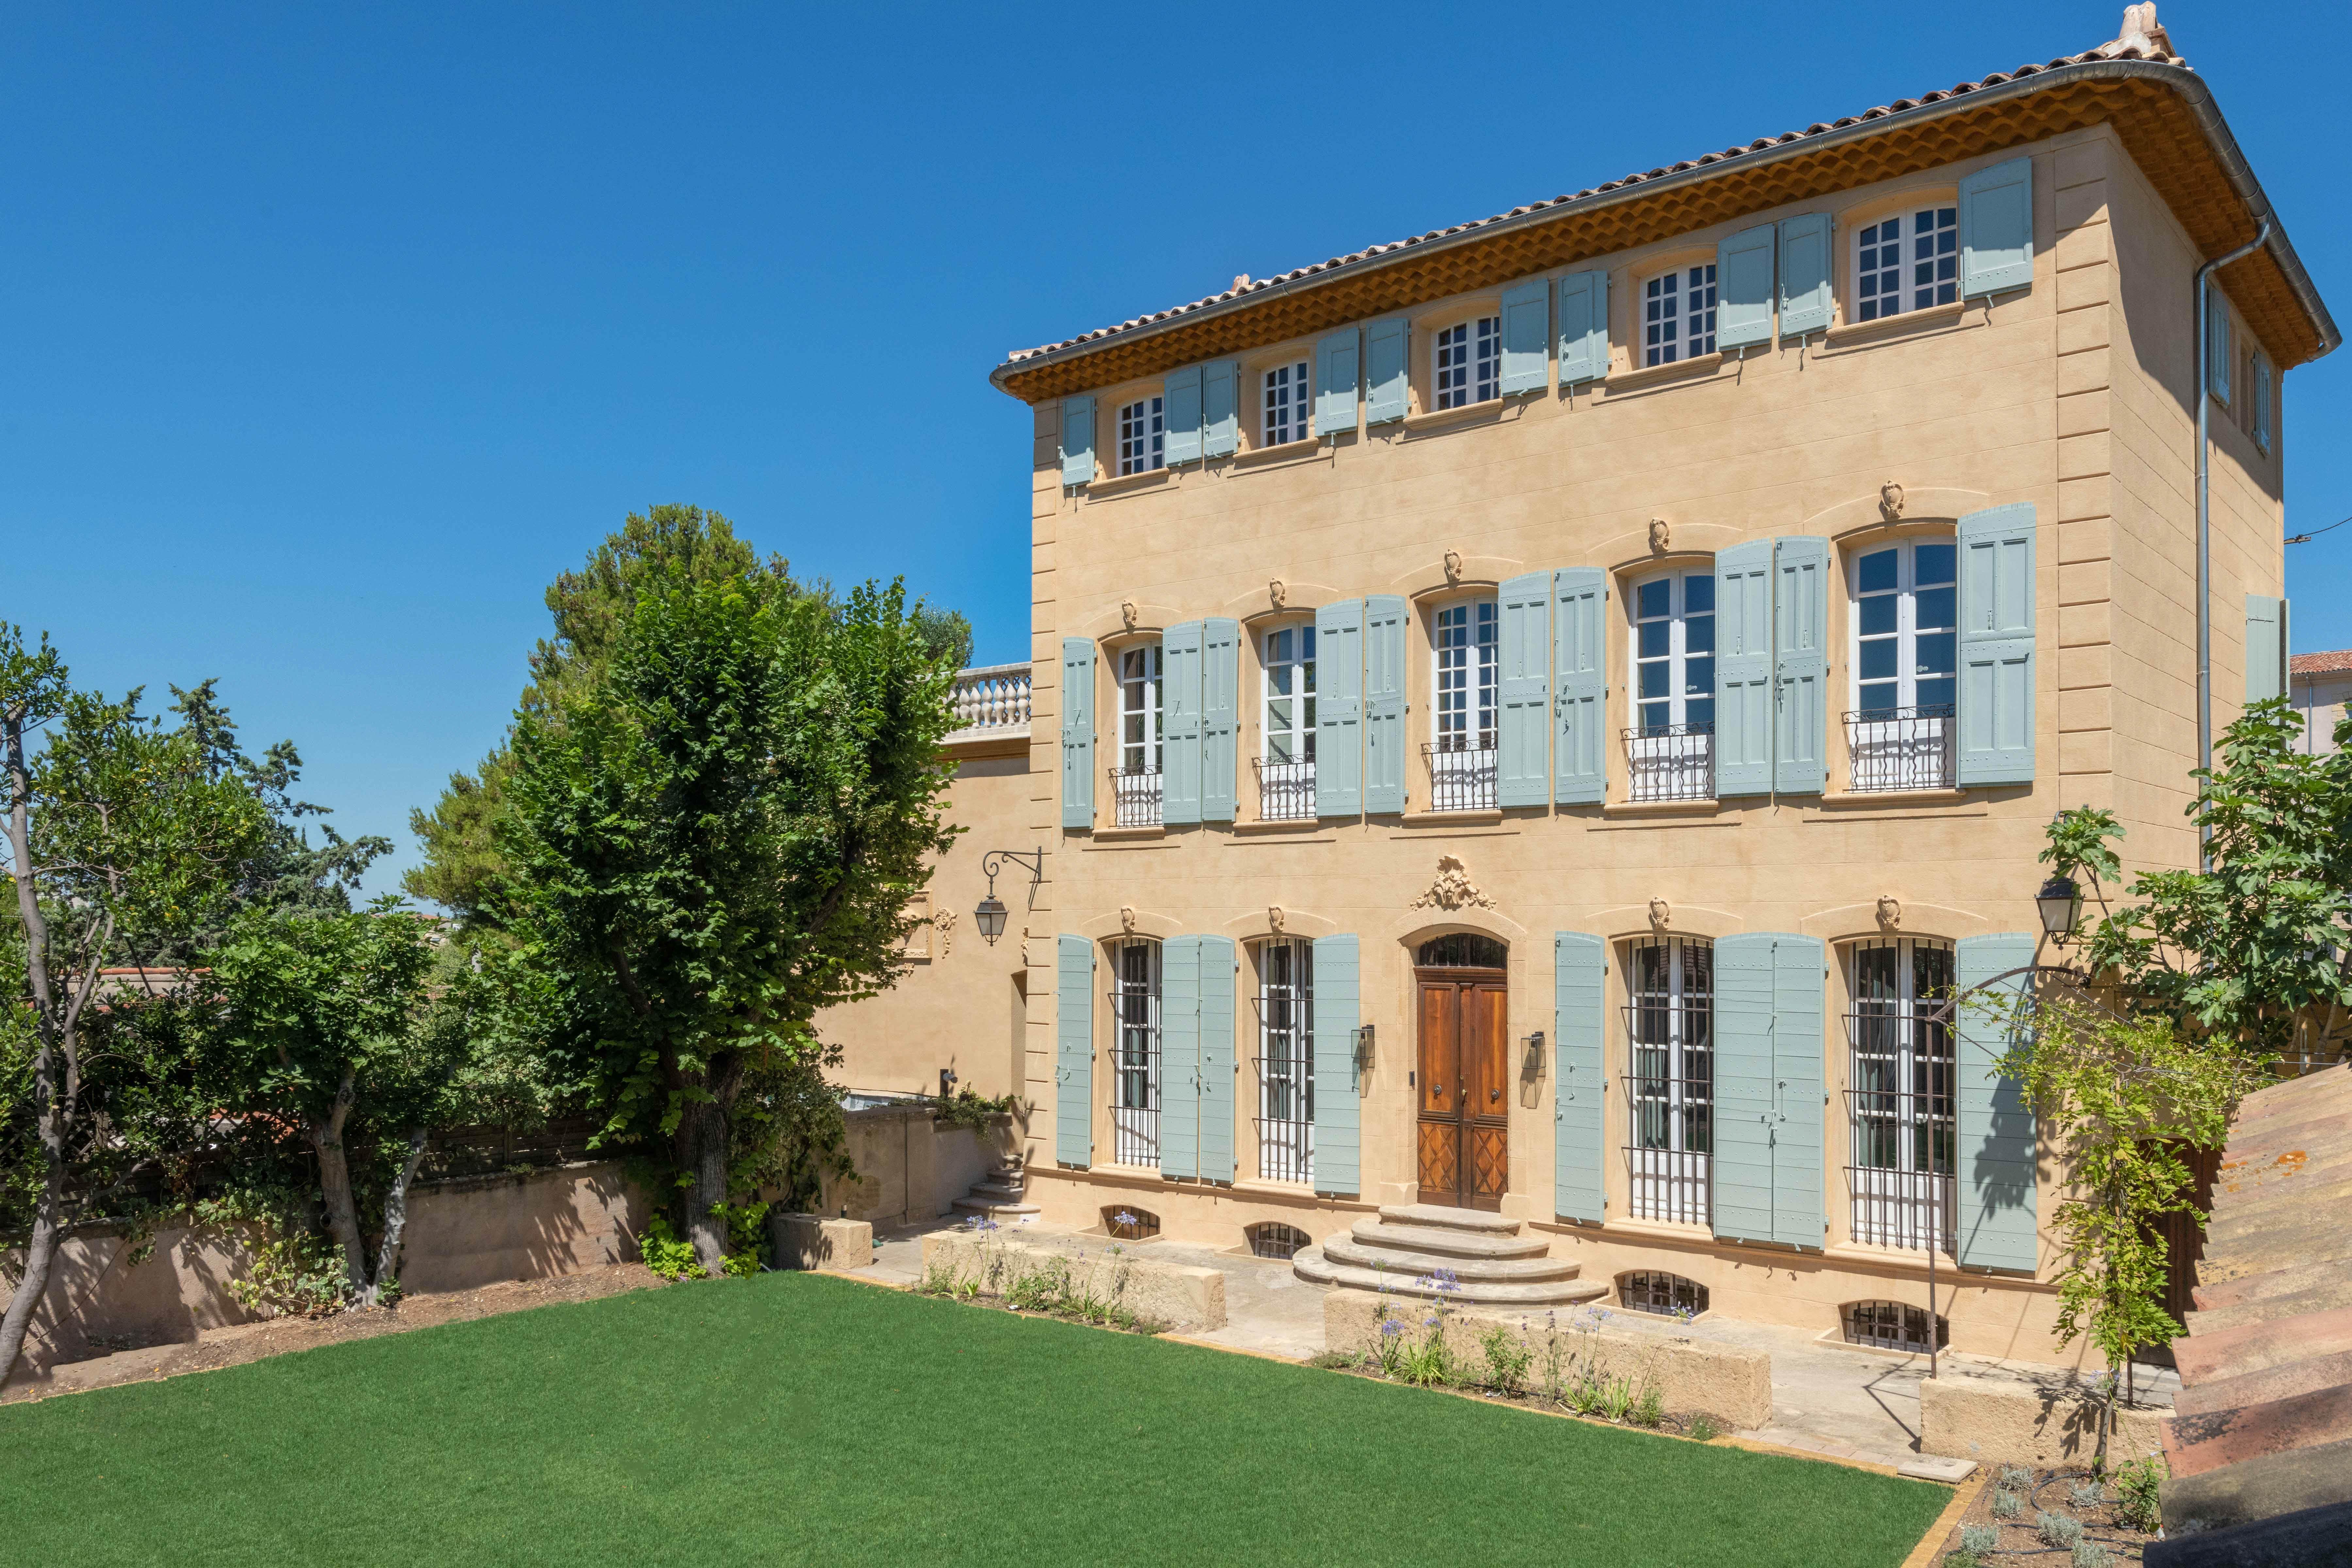 Villa Acantha - Le jardin